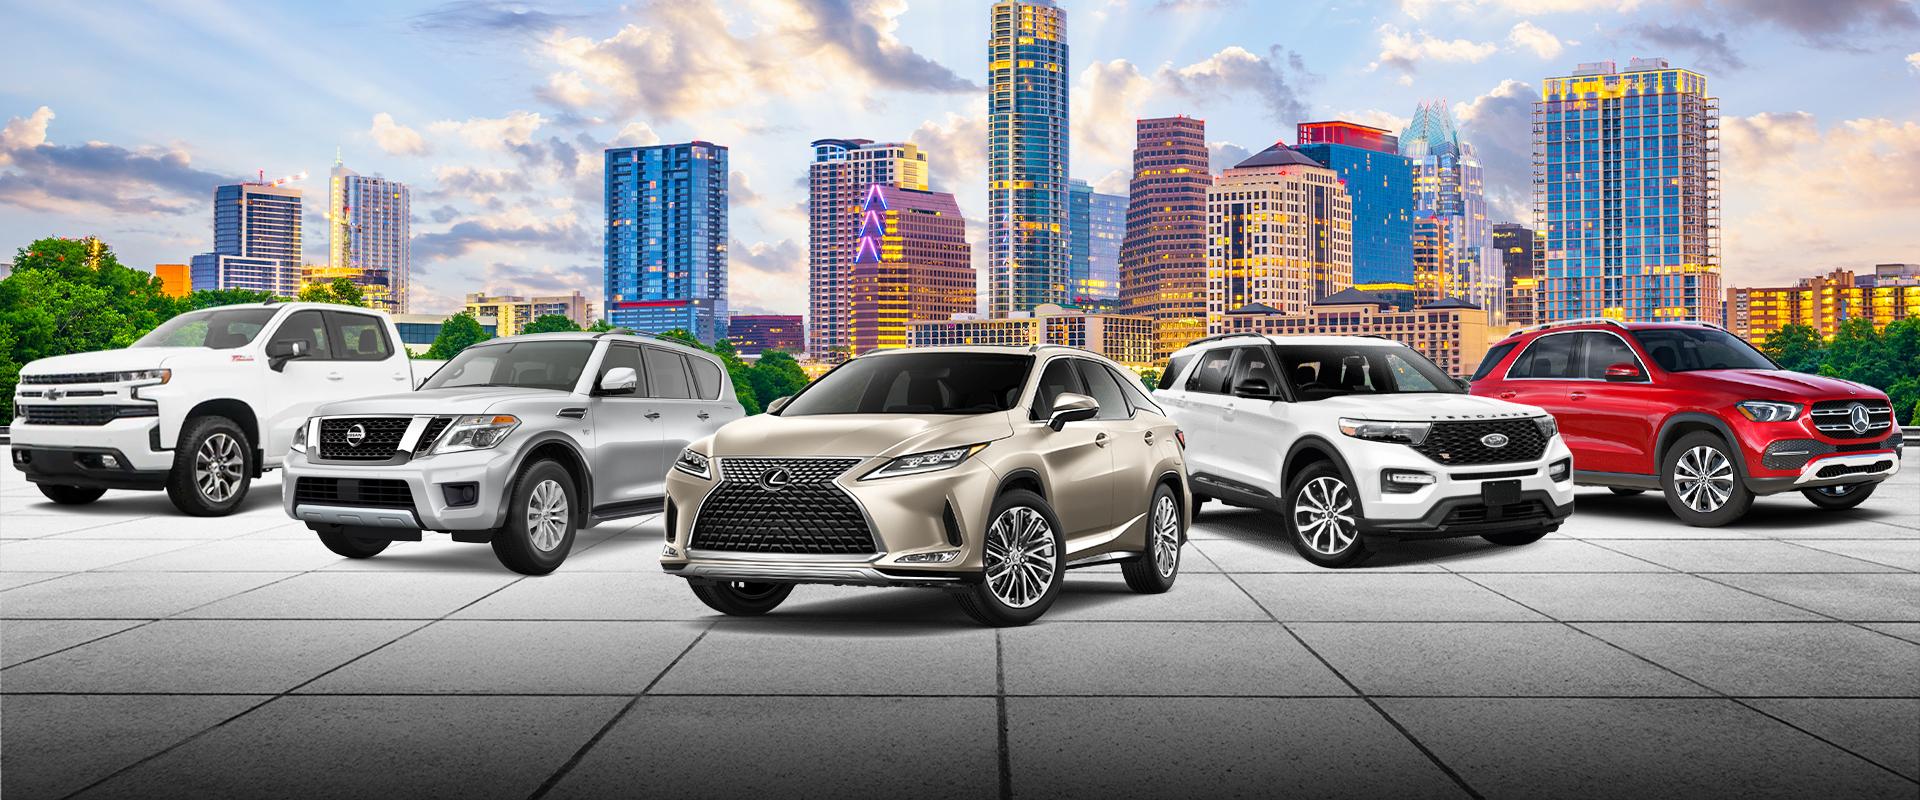 Austin Skyline with new cars